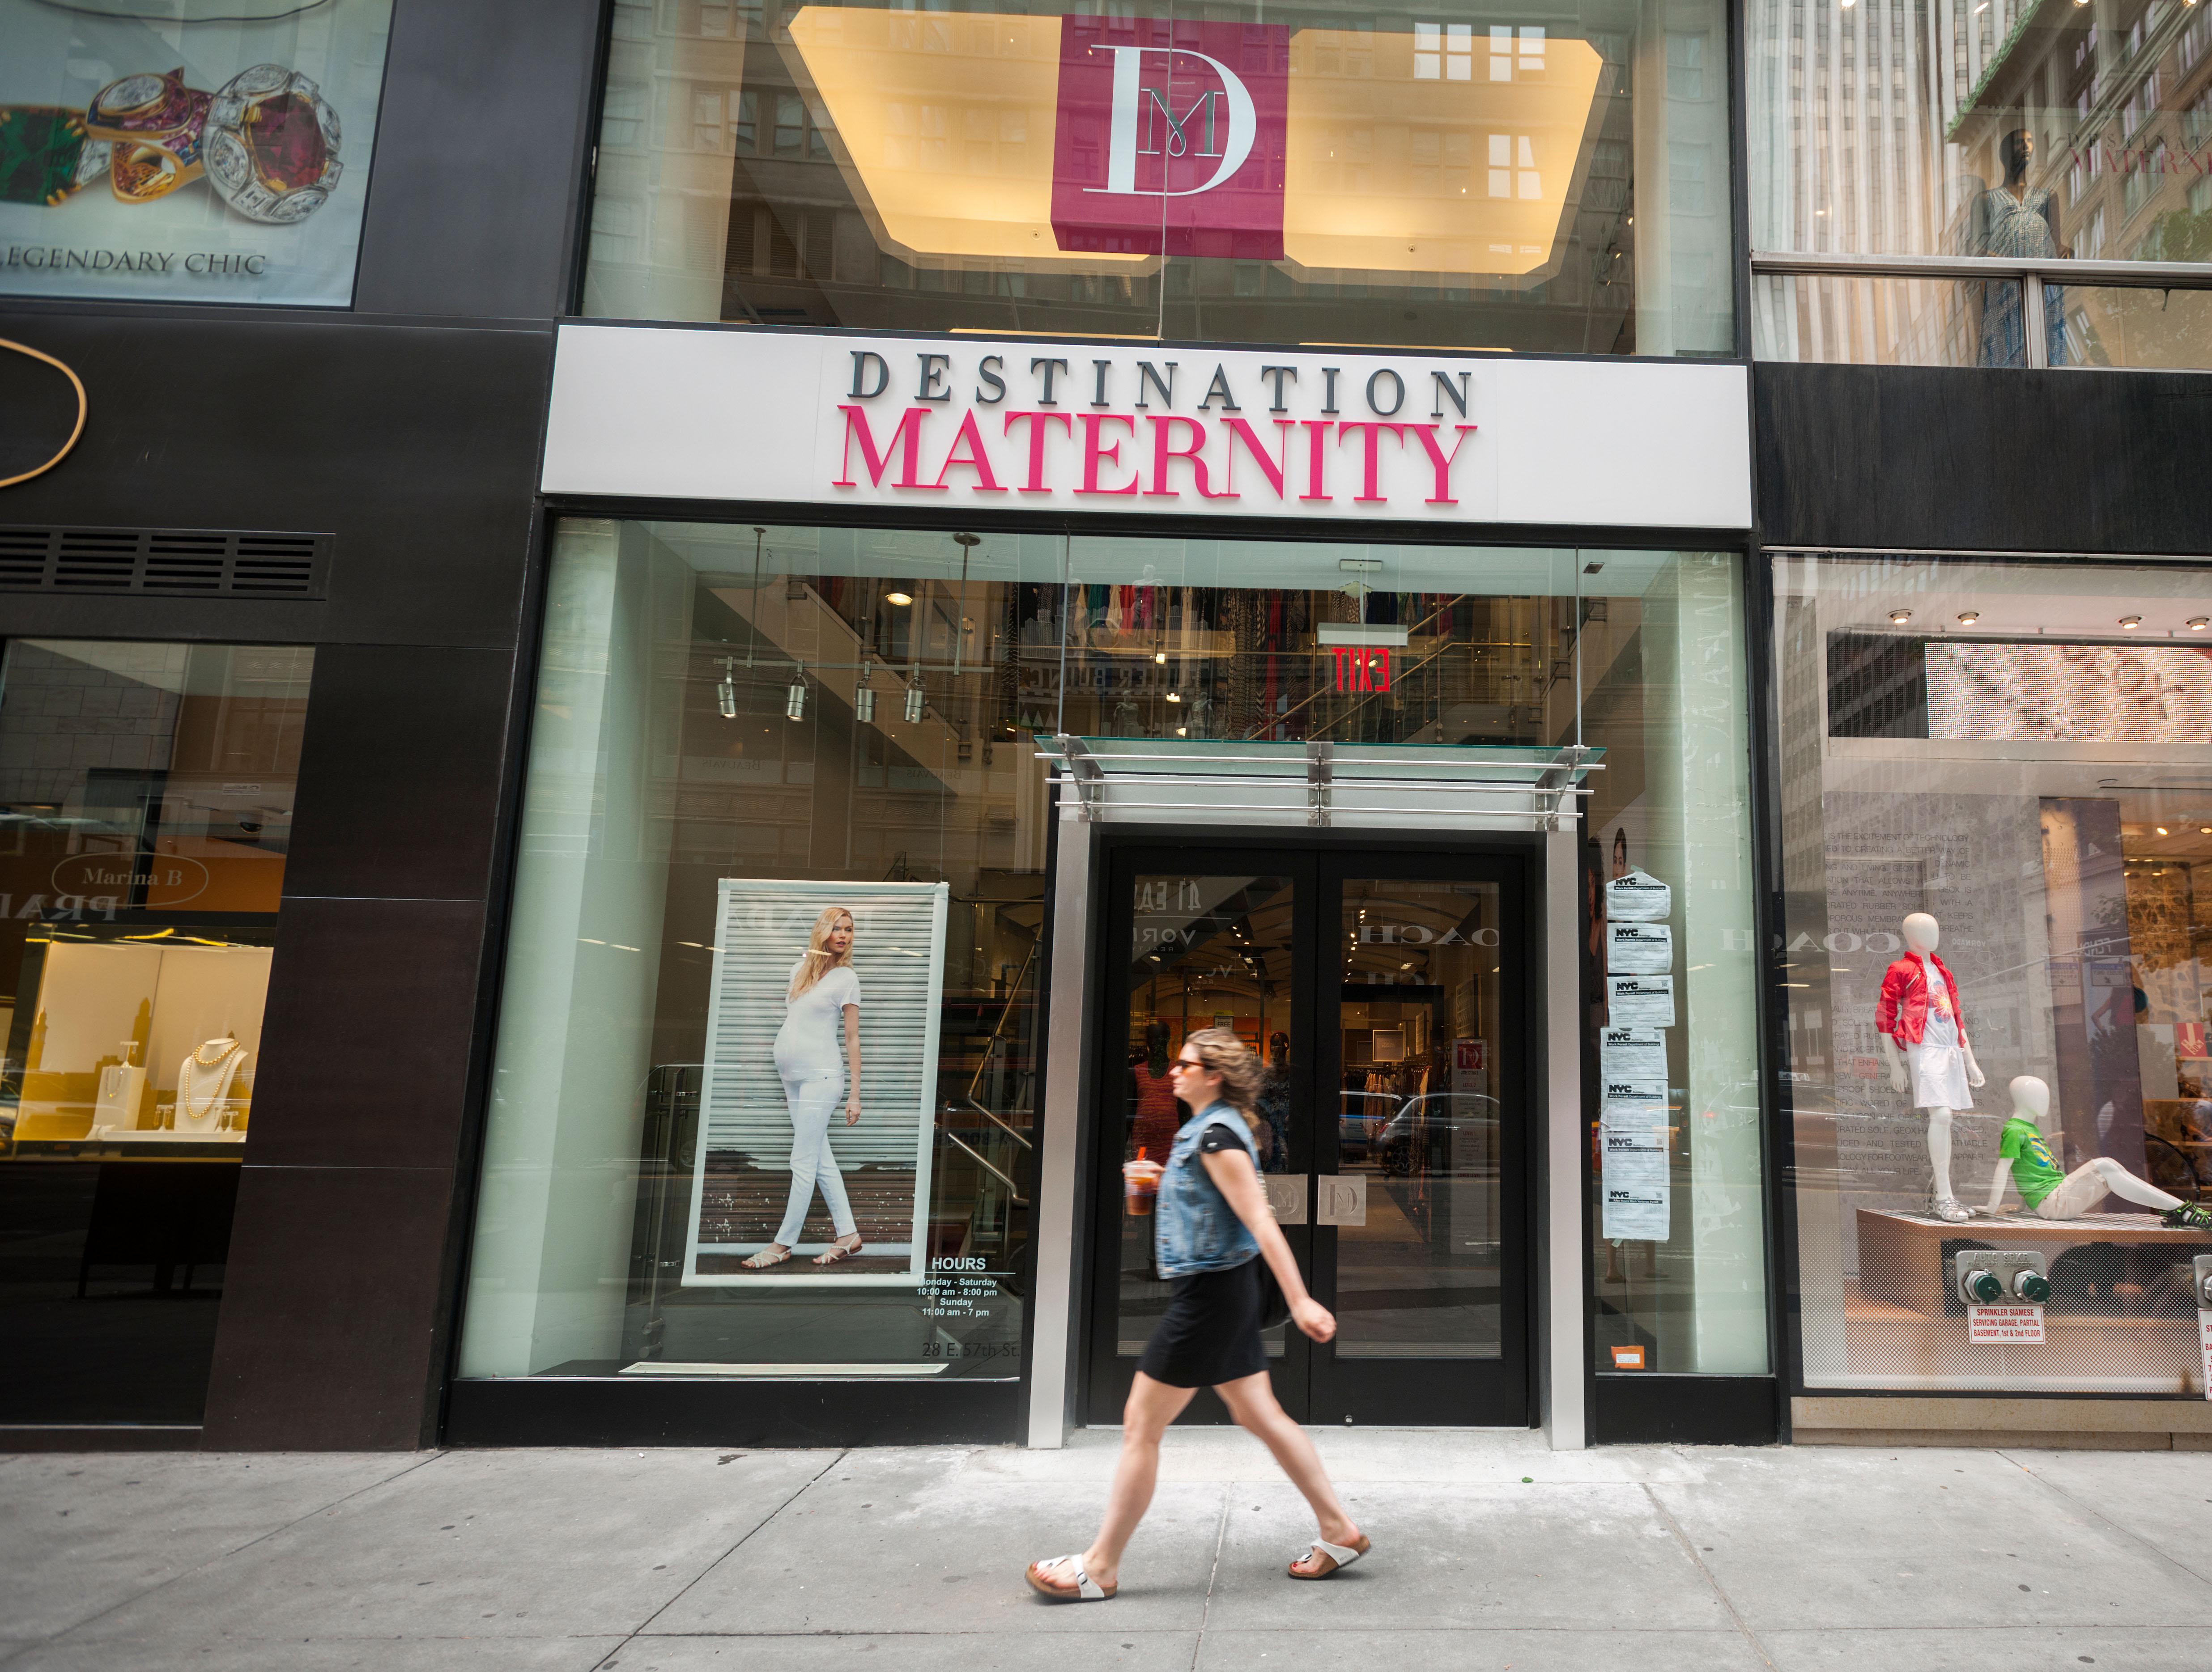 A Destination Maternity store in Midtown Manhattan in New York